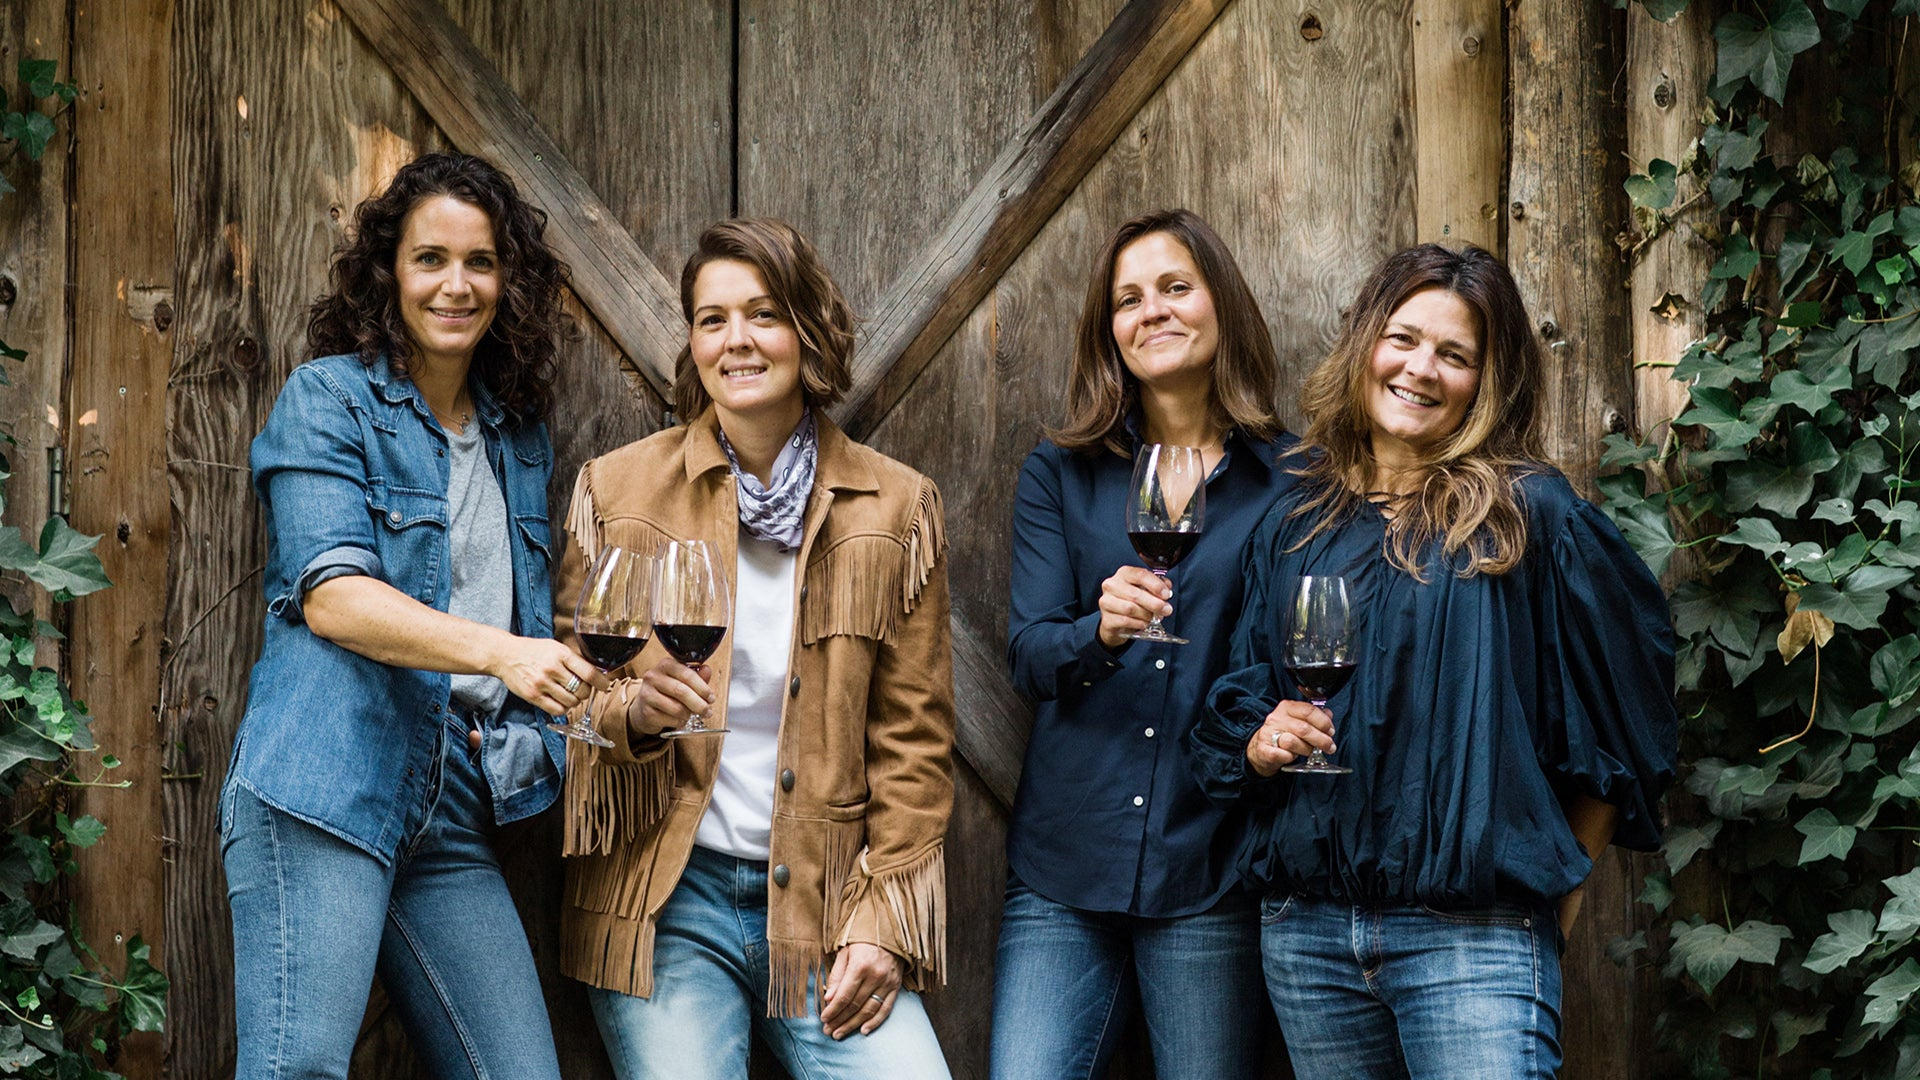 Brandi Carlile Brings Women in Wine to Live Nation's Virtual Happy Hour